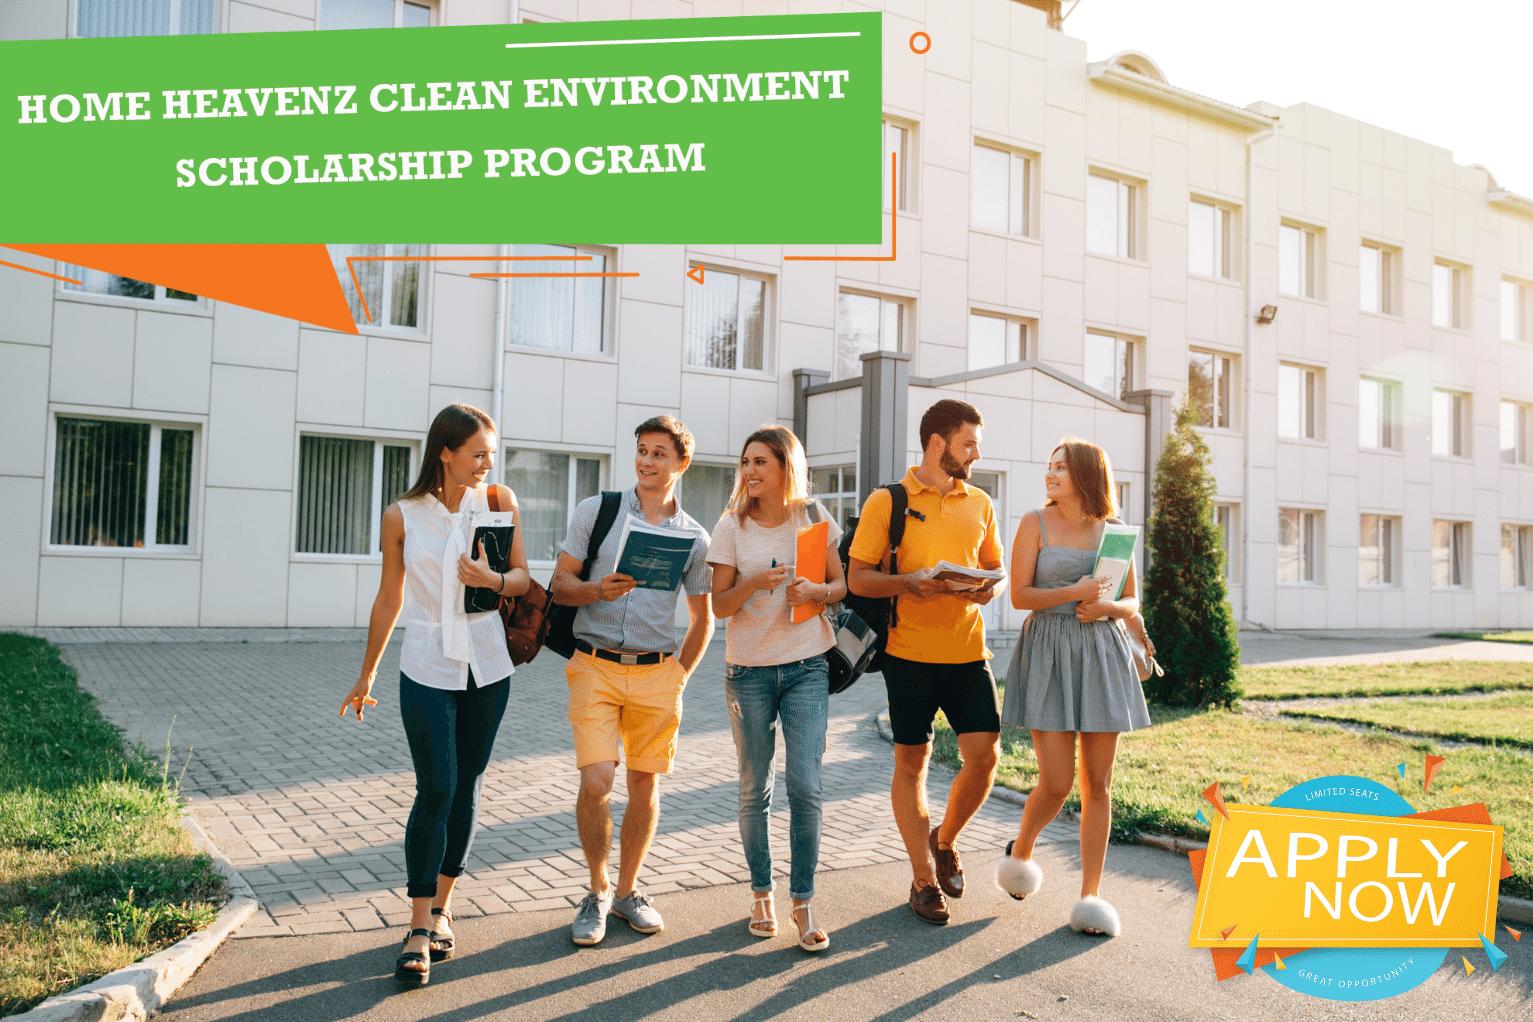 Home Heavenz clean environment scholarship program